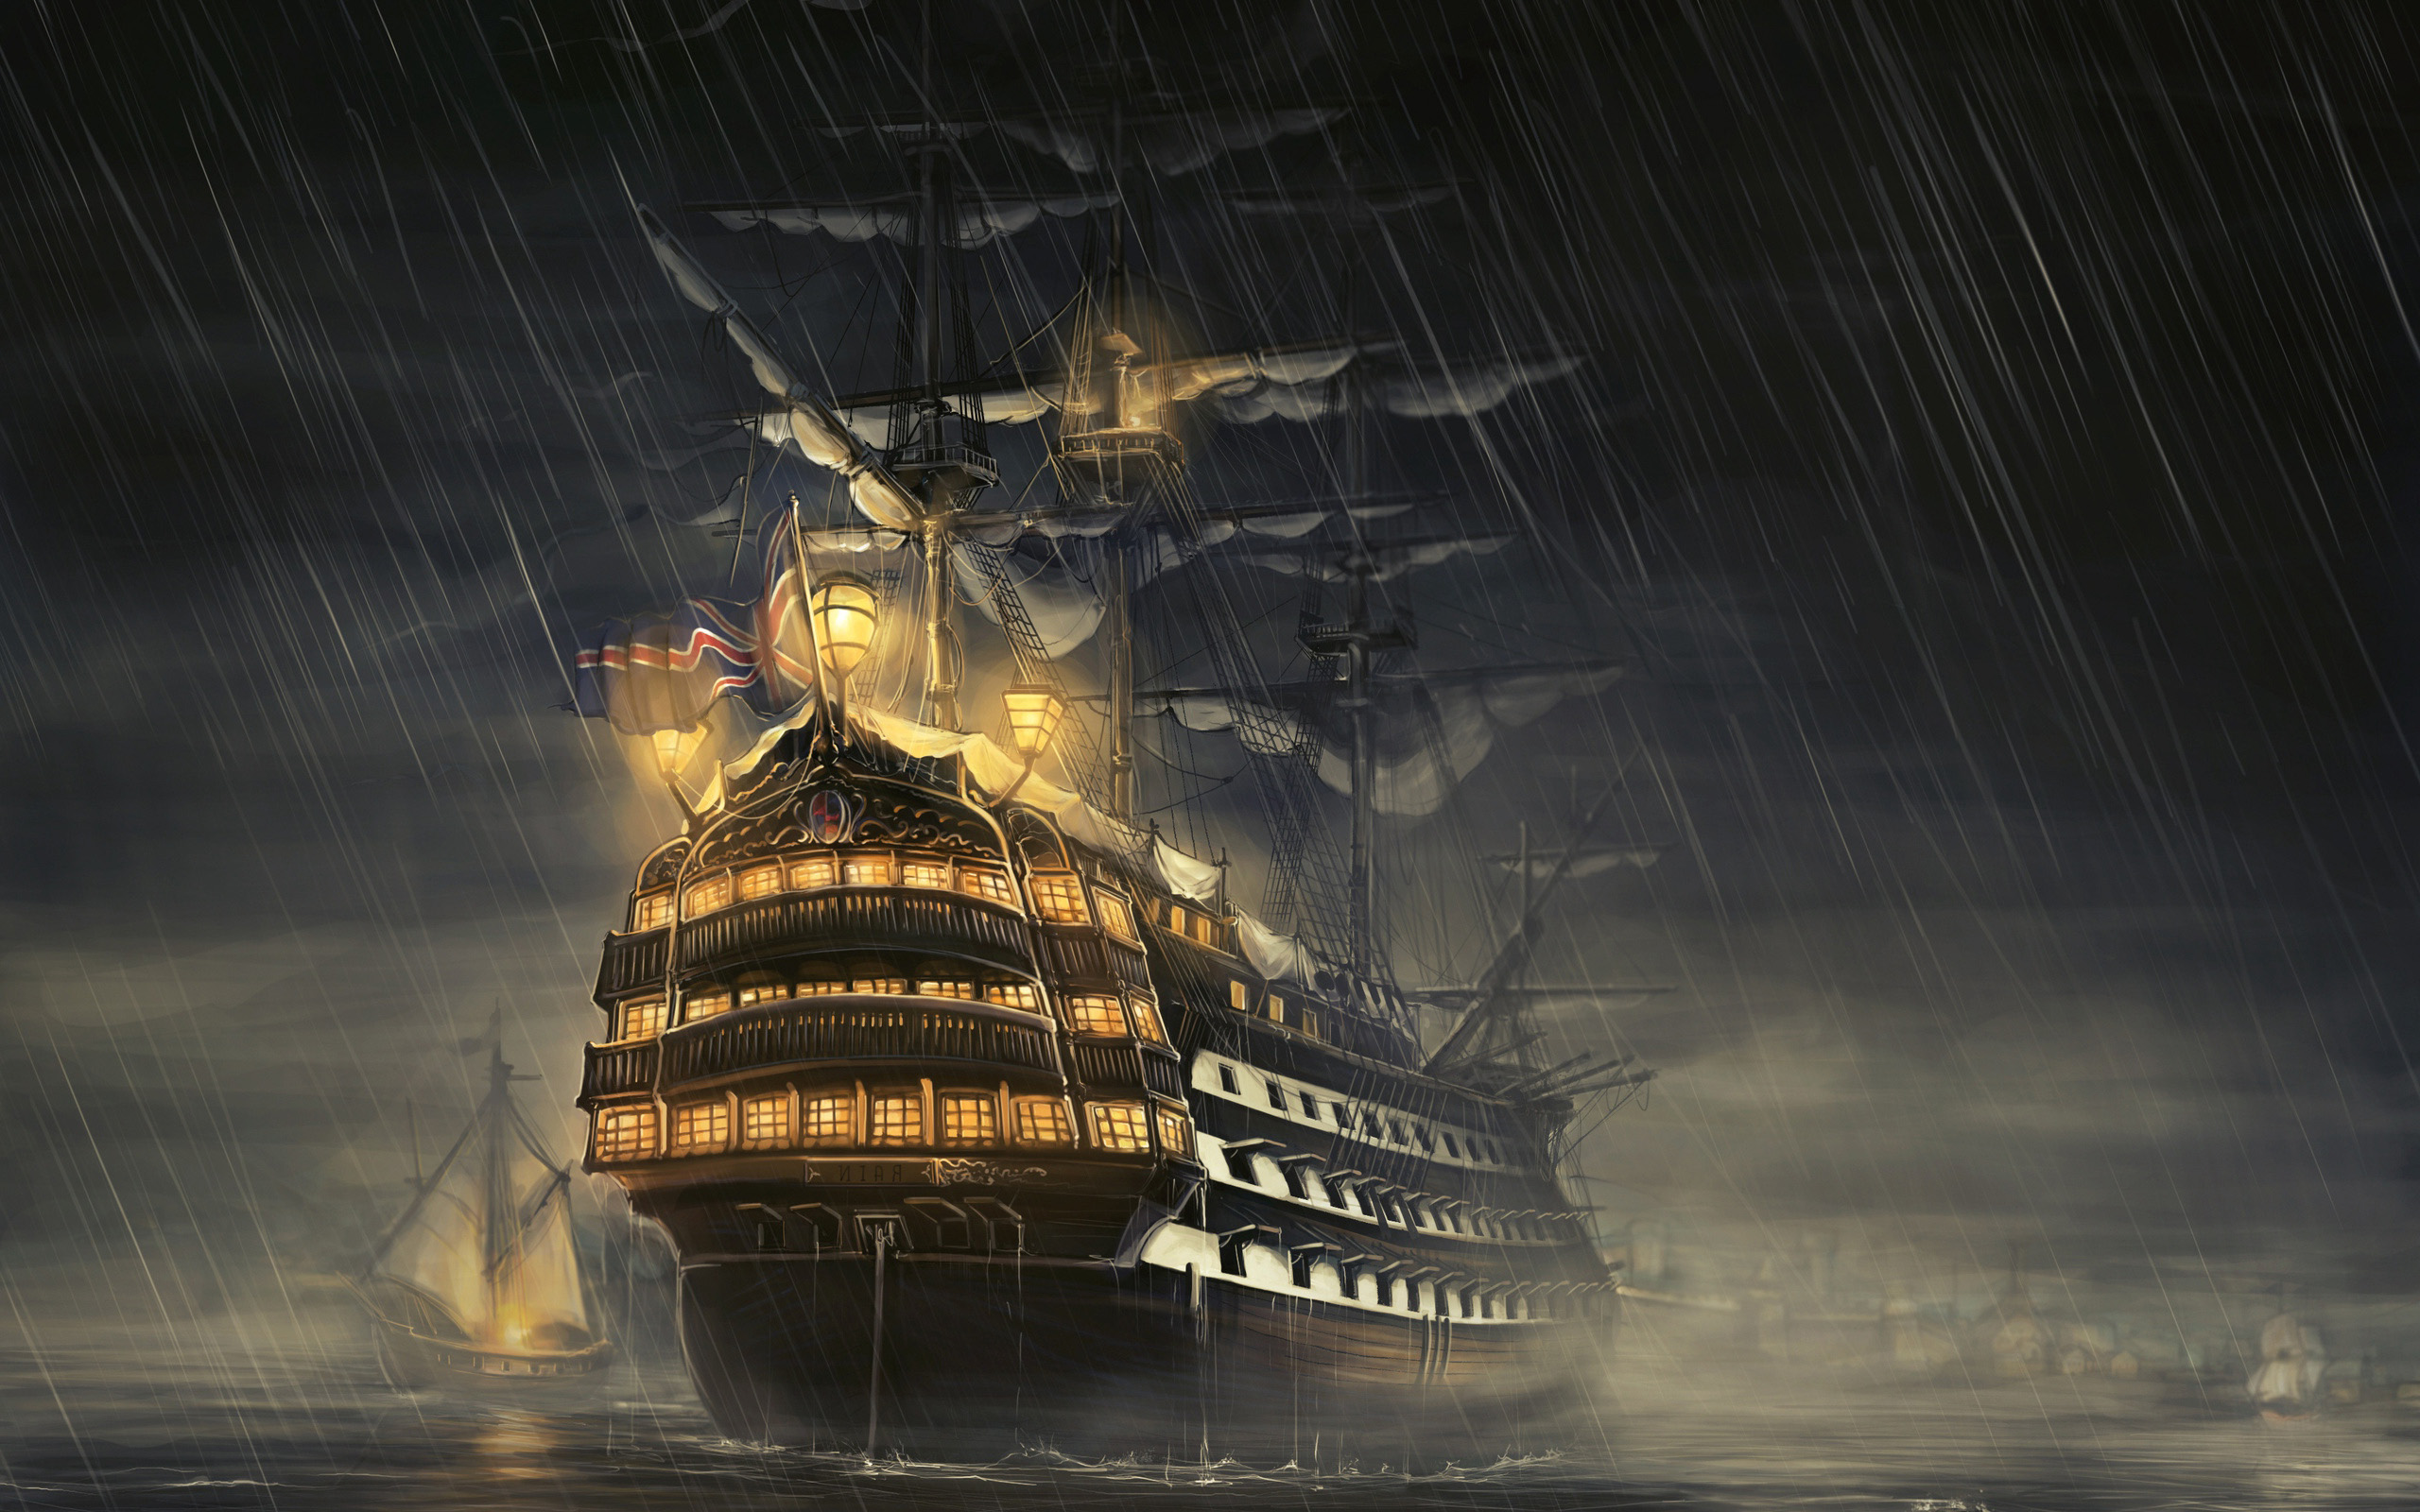 HDoboi.Kiev.ua - Старый корабль в тумане из мира фэнтези